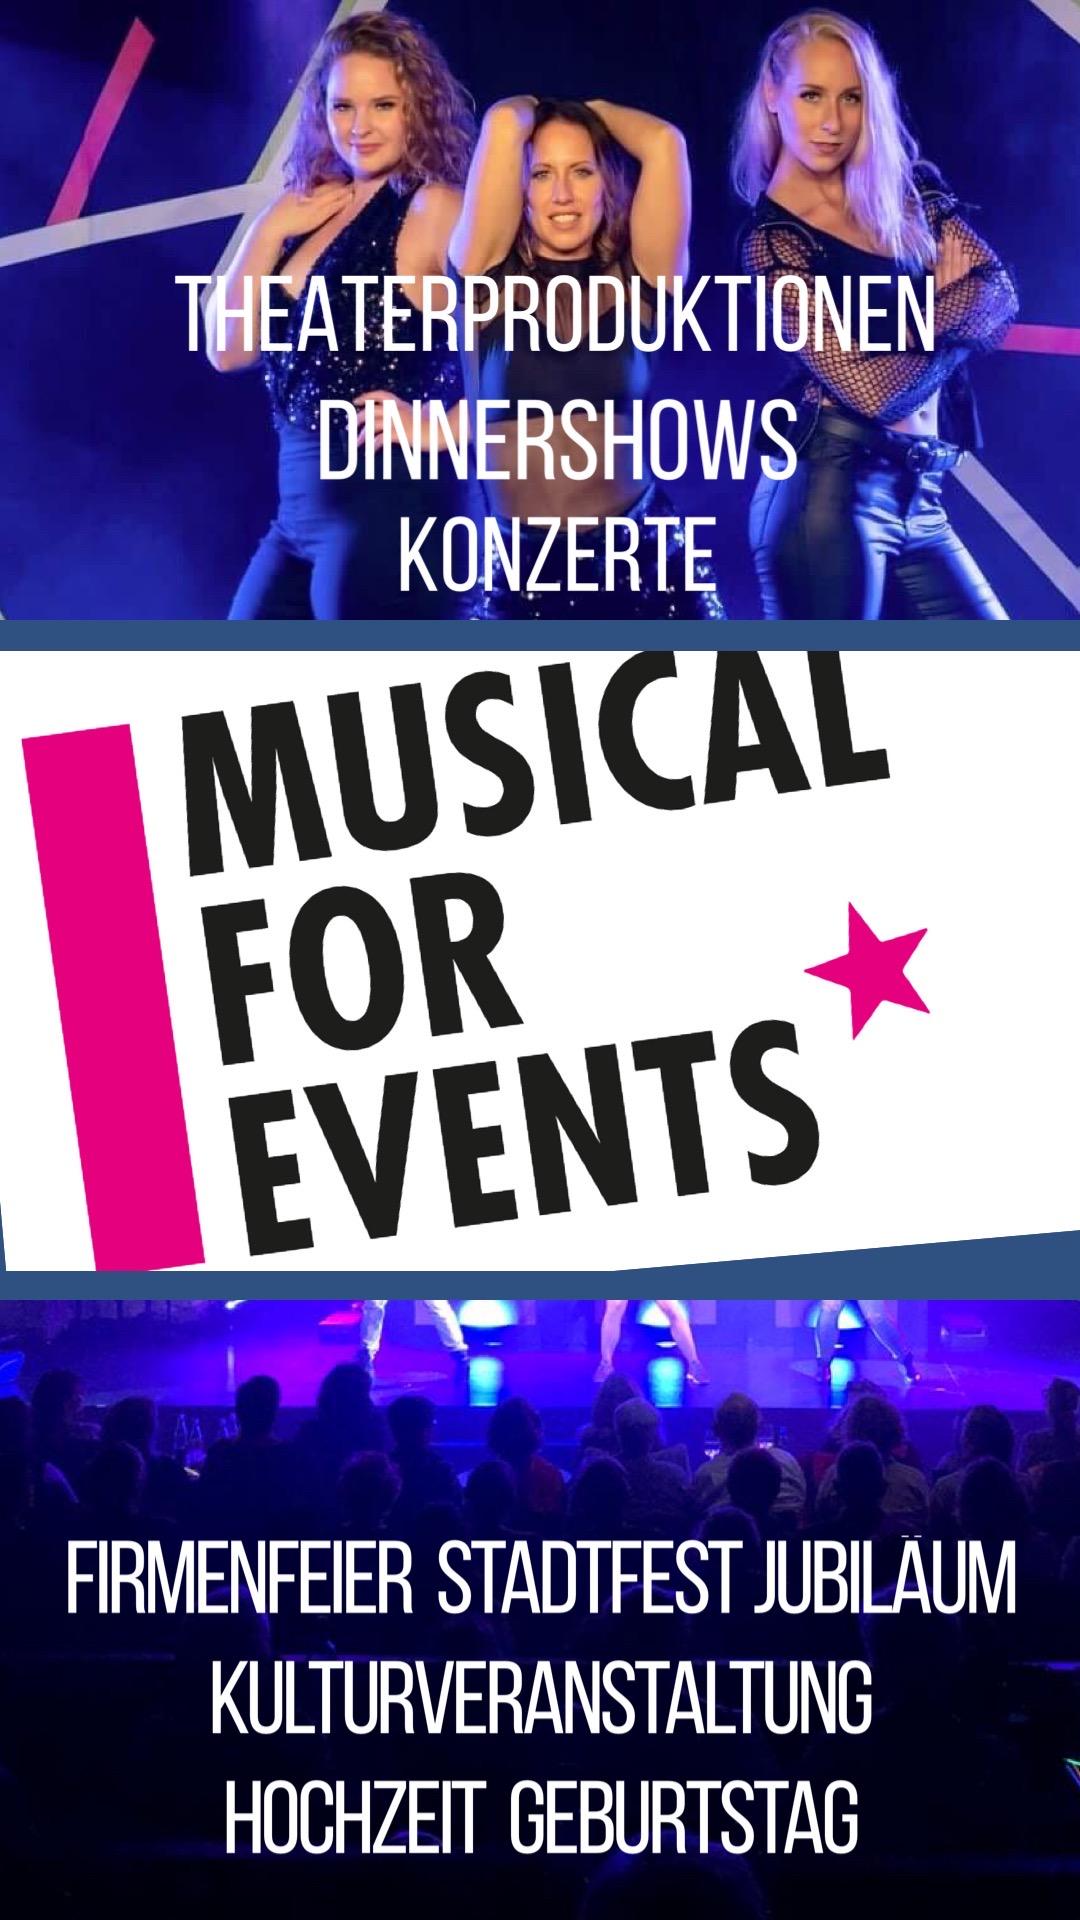 Theaterproduktionen, Dinnershows, Konzerte - Musical for Events